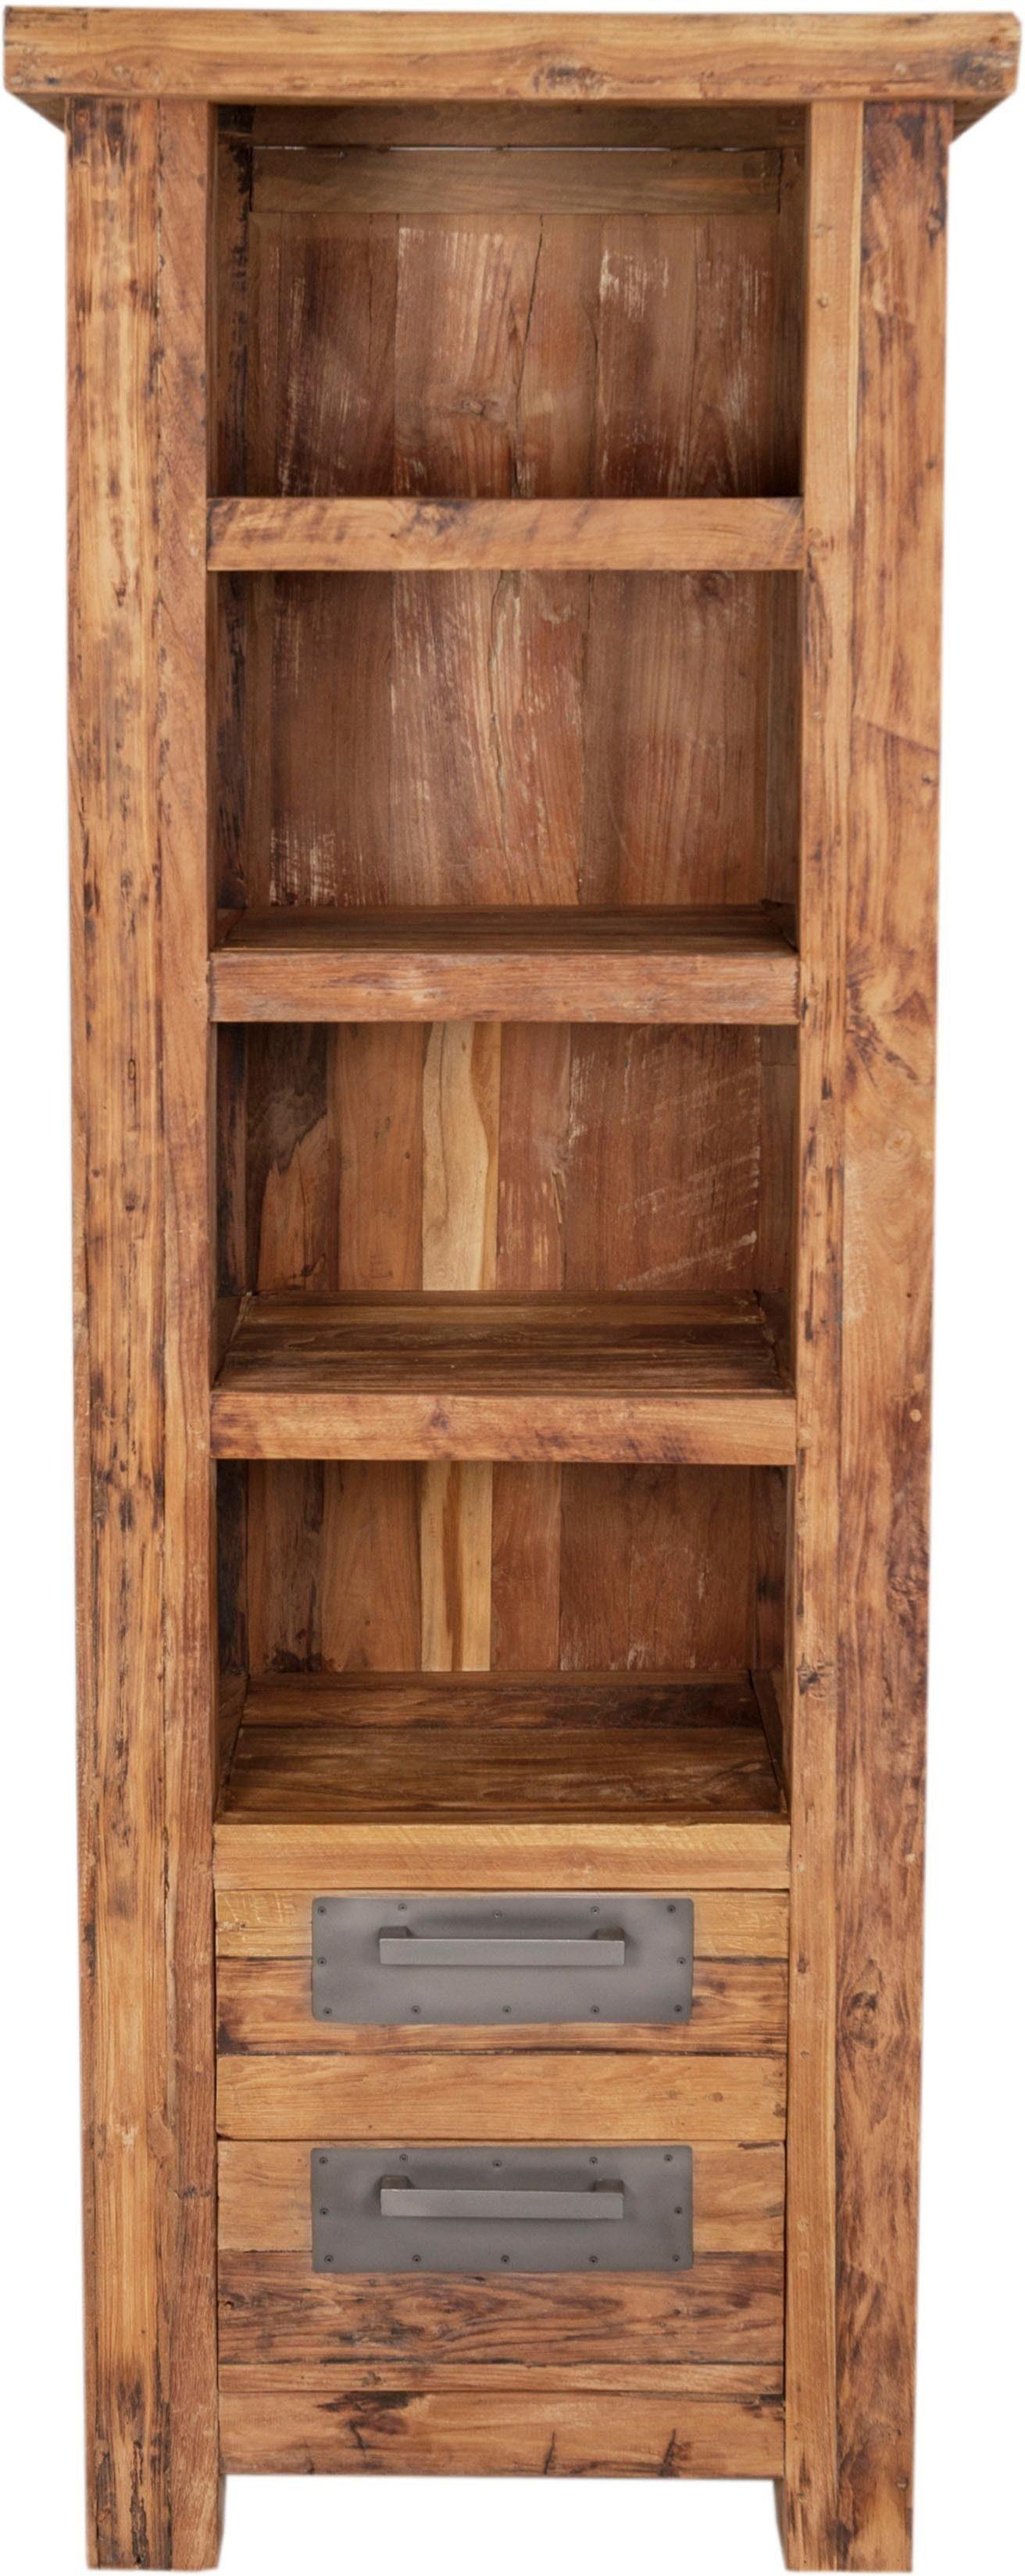 SIT Bücherregal »Coral« aus recyceltem Teak-Altholz, Höhe 195 cm